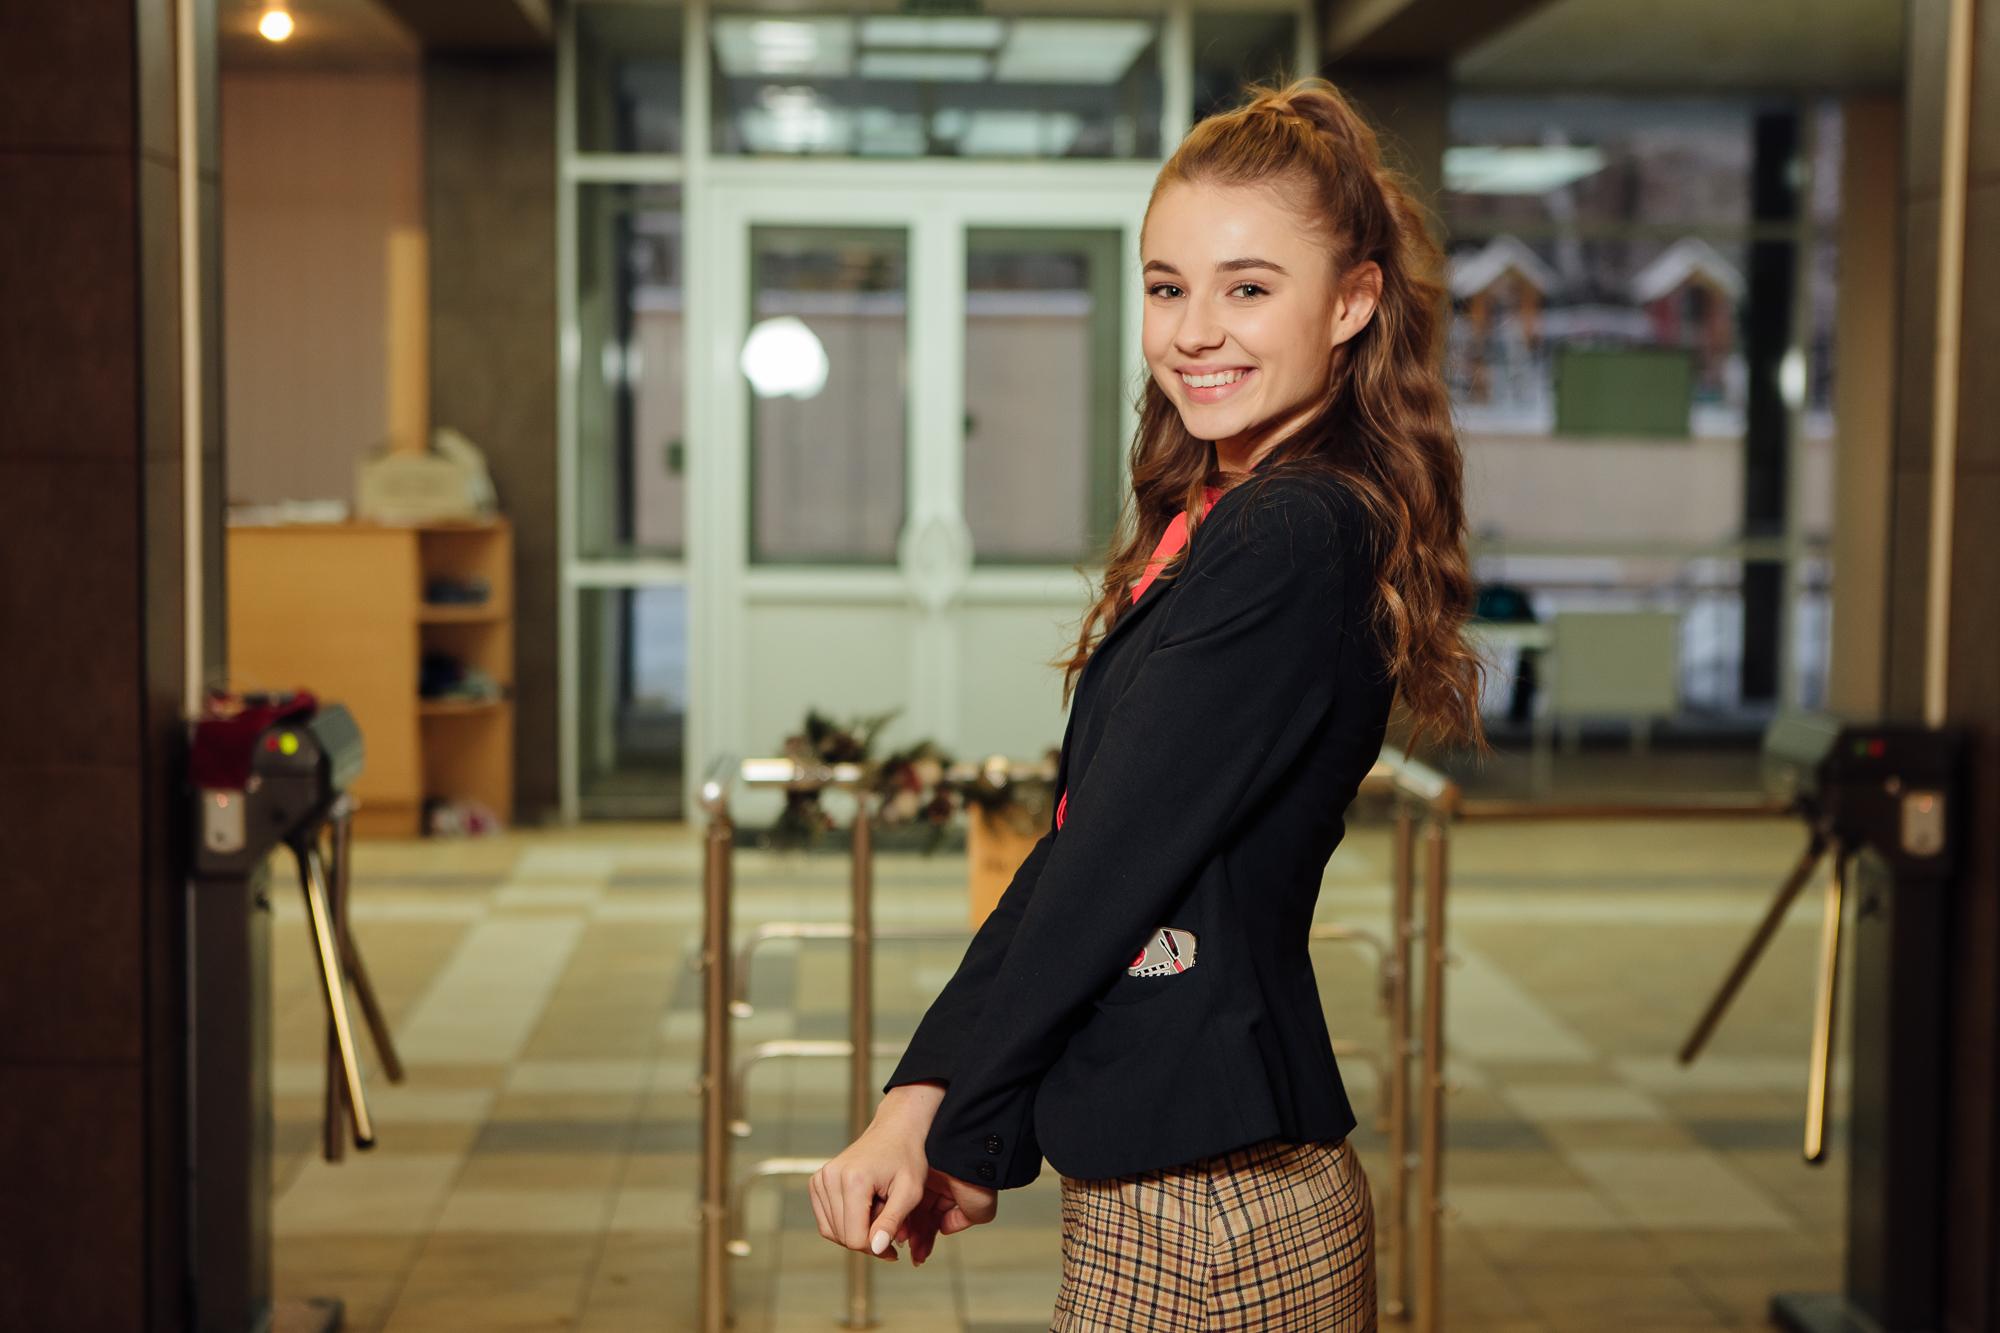 Лиза Василенко присоединилась к фан-туру сериала